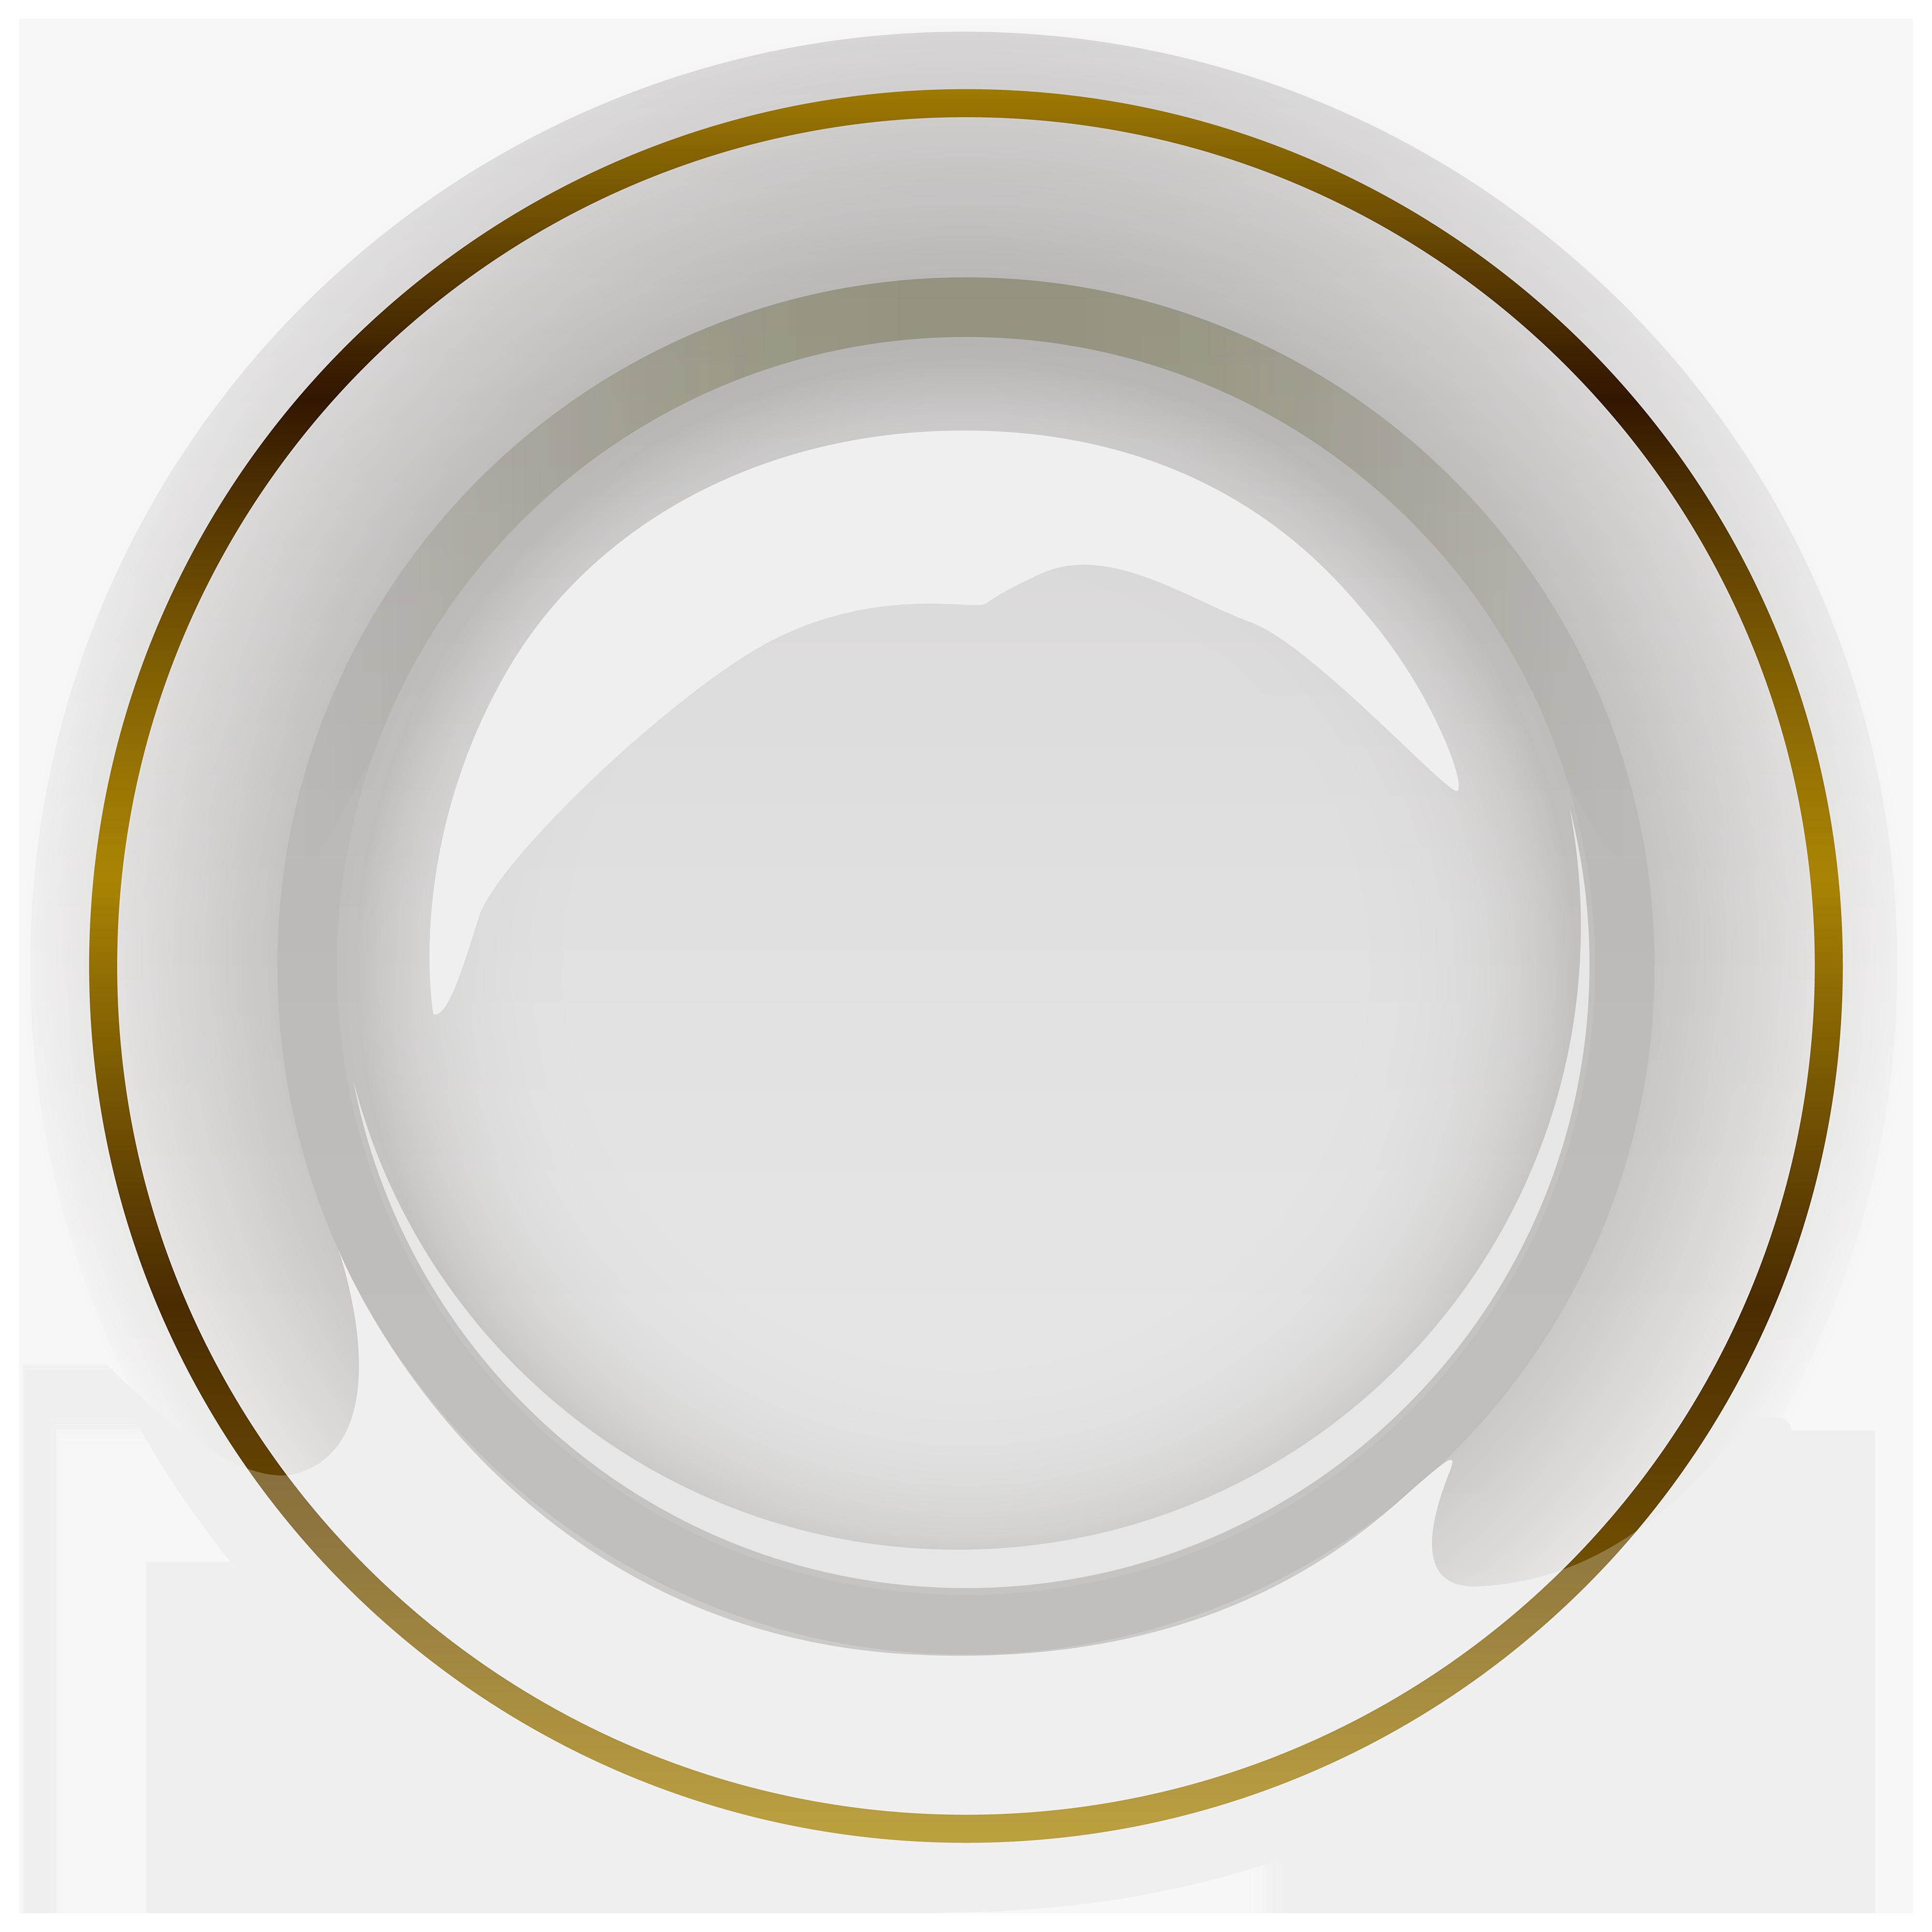 Elegant Plate P. - Plate, Transparent background PNG HD thumbnail